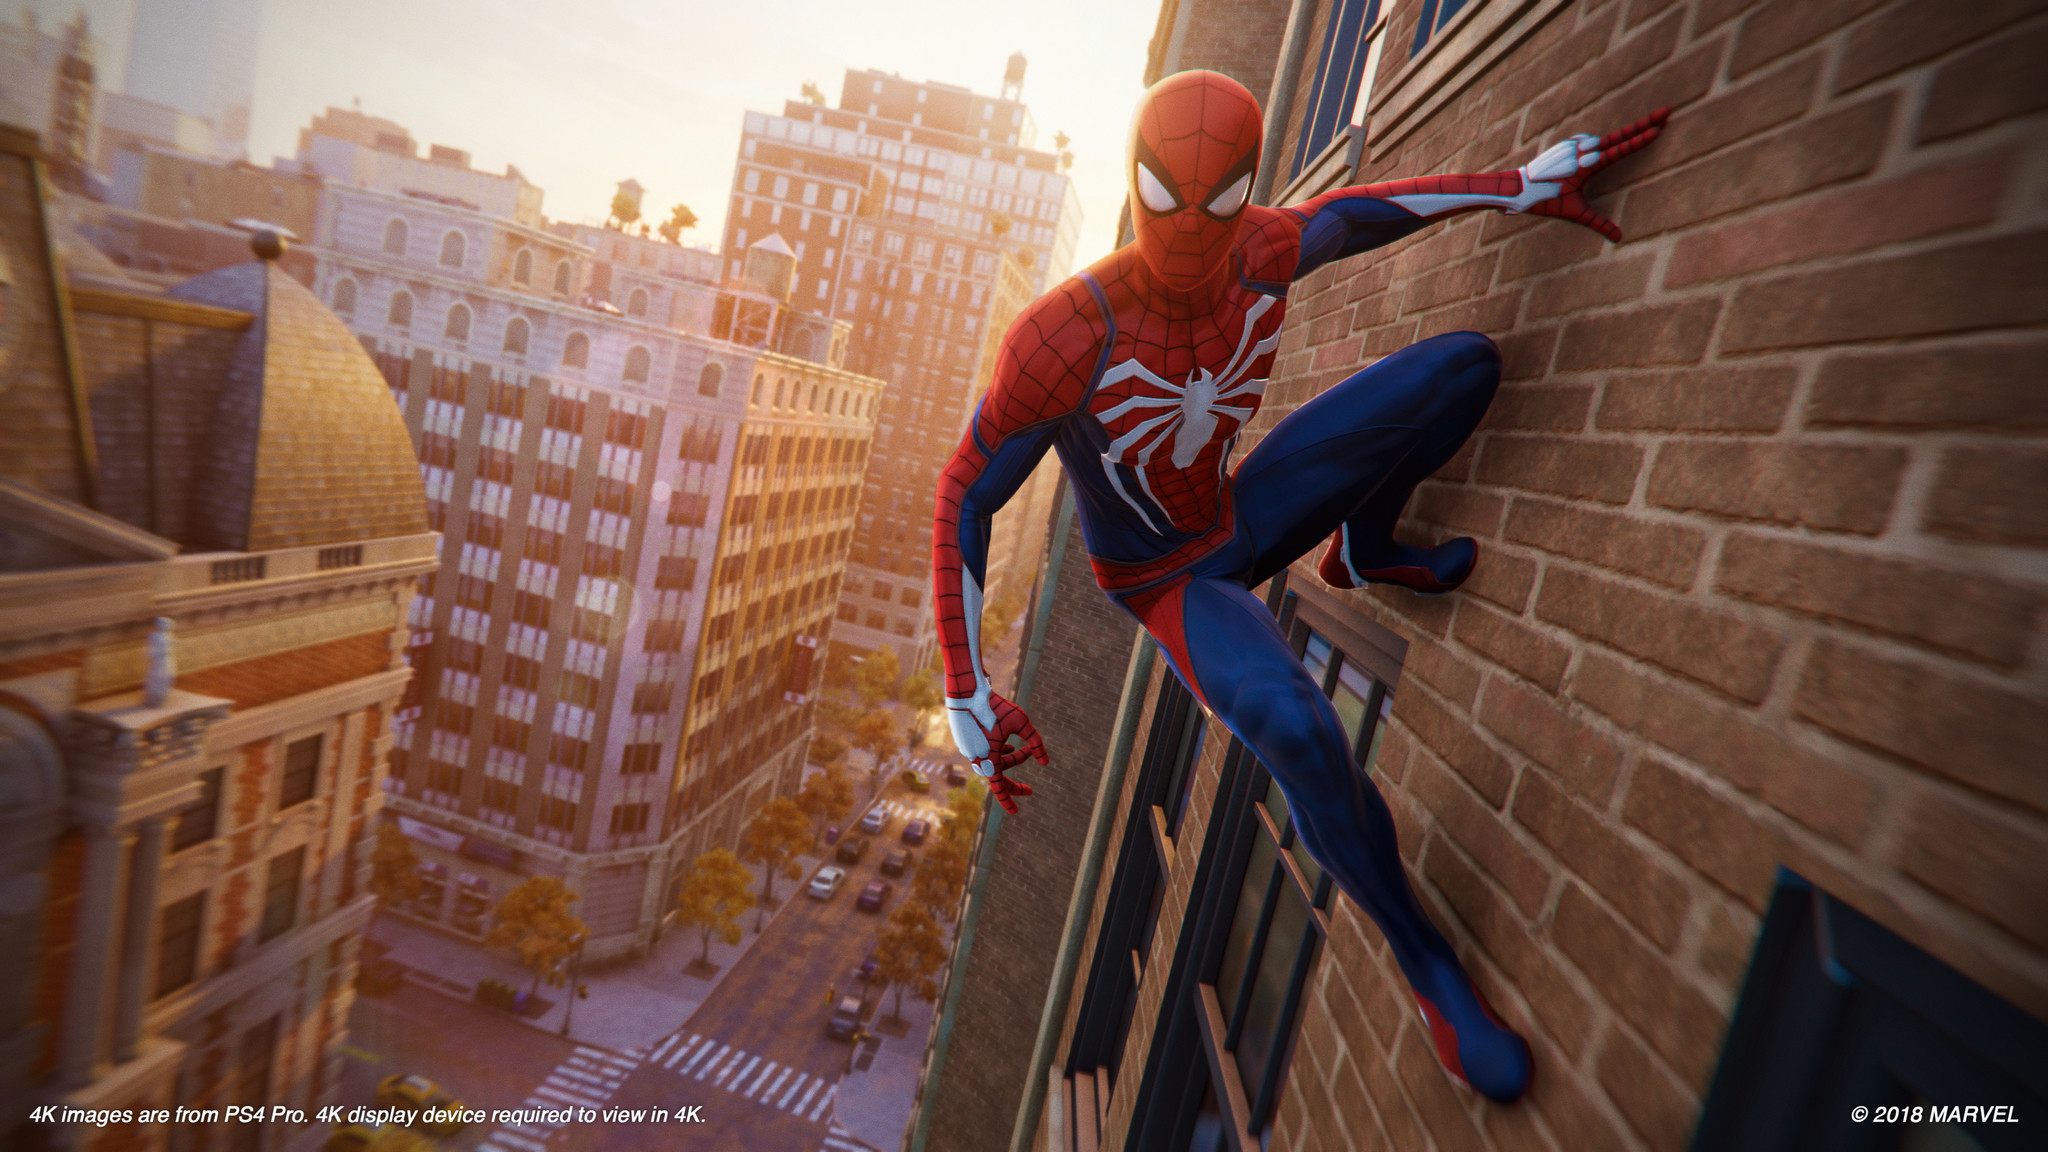 Tinhte_Spiderman1.jpg